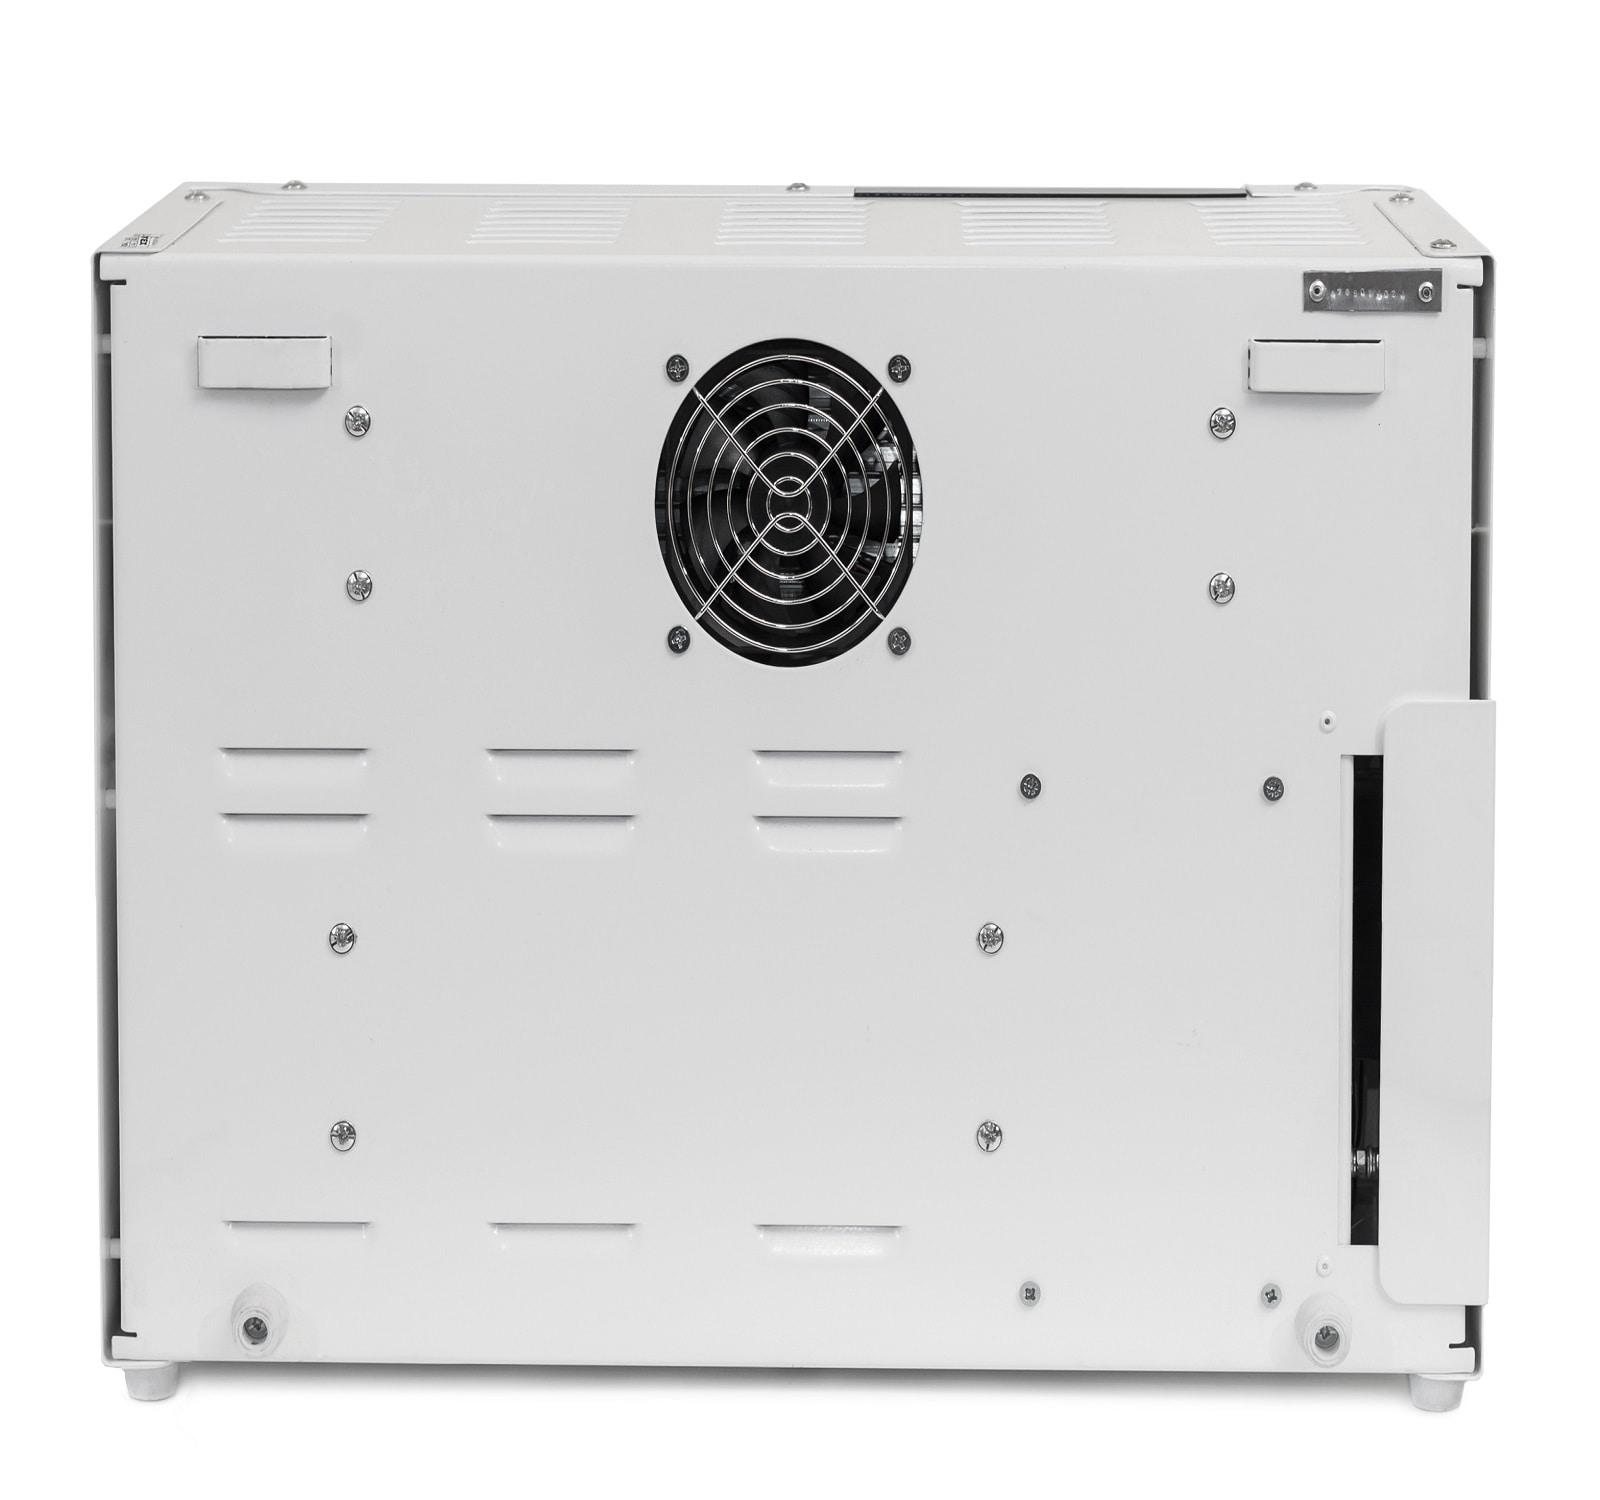 Стабилизаторы напряжения - Стабилизатор напряжения 6 кВт РRIME 000001453 - Фото 2